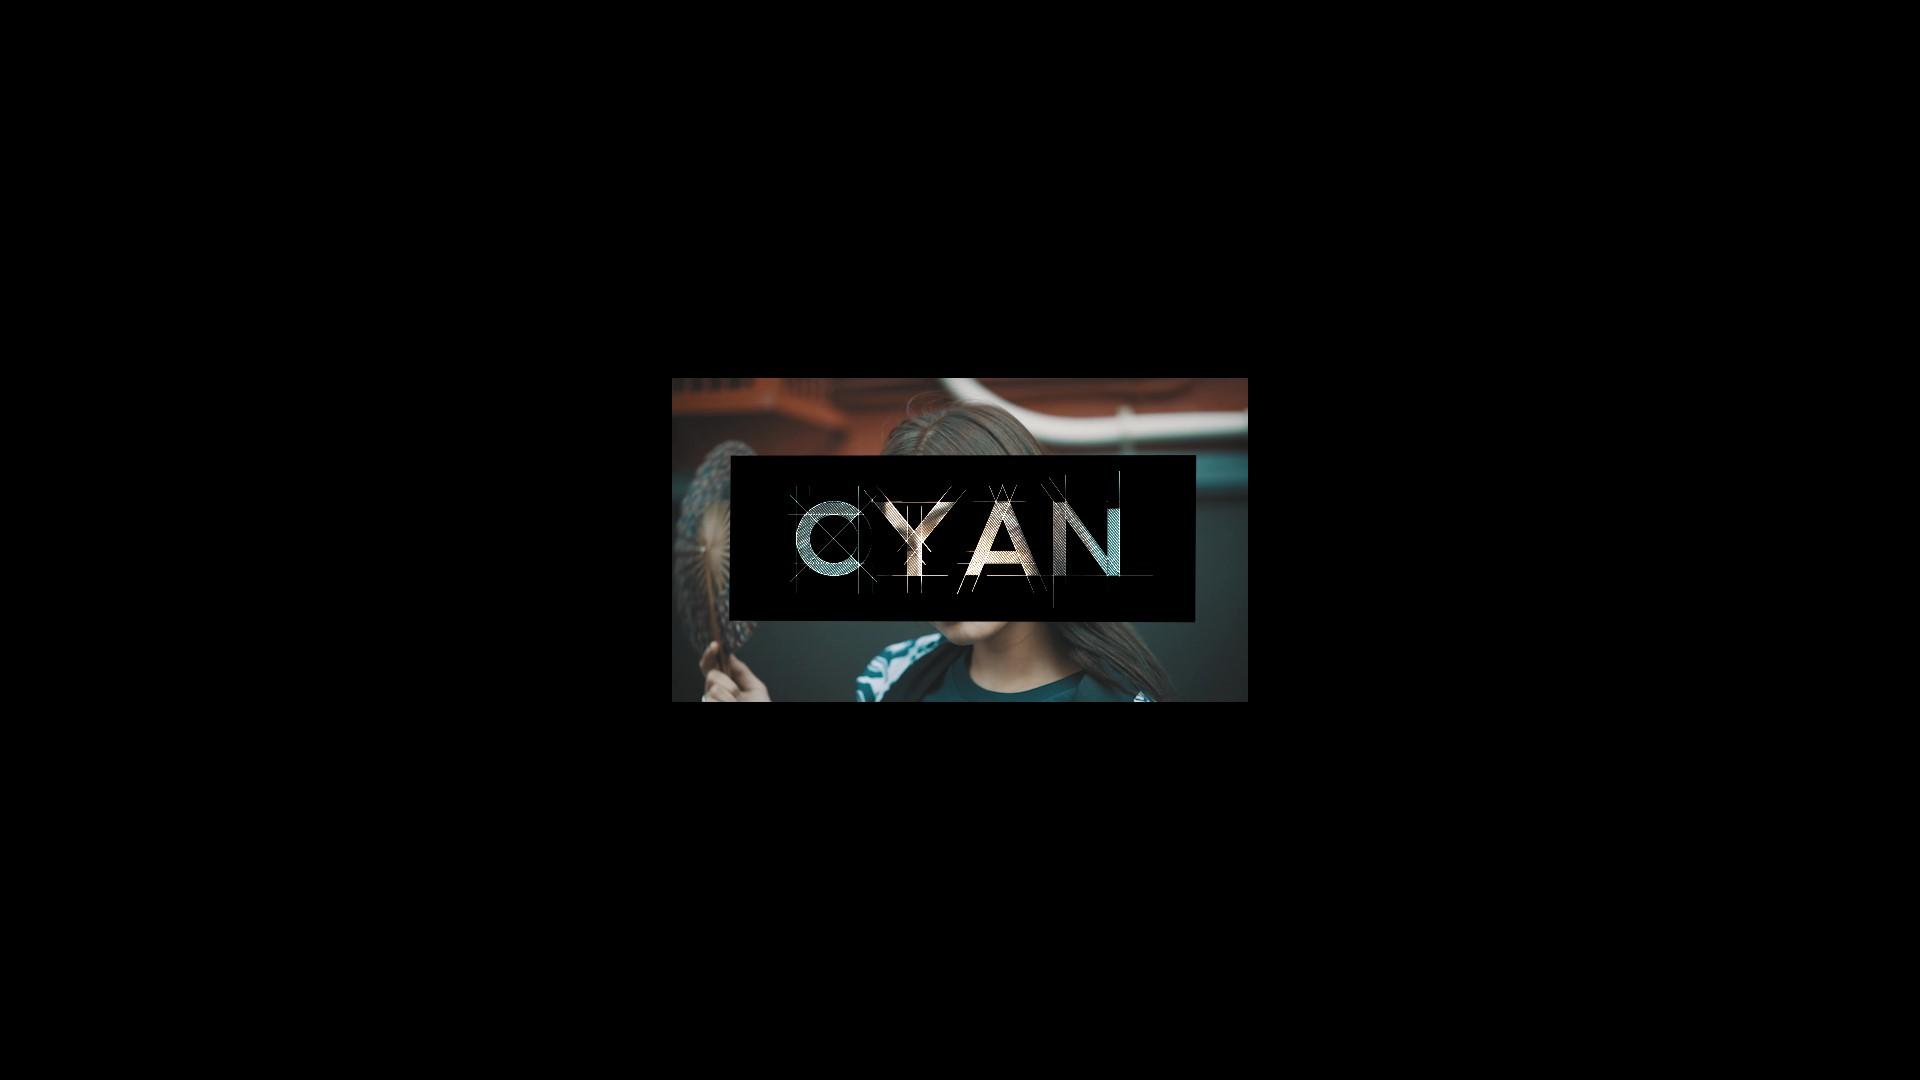 CYAN-showreel